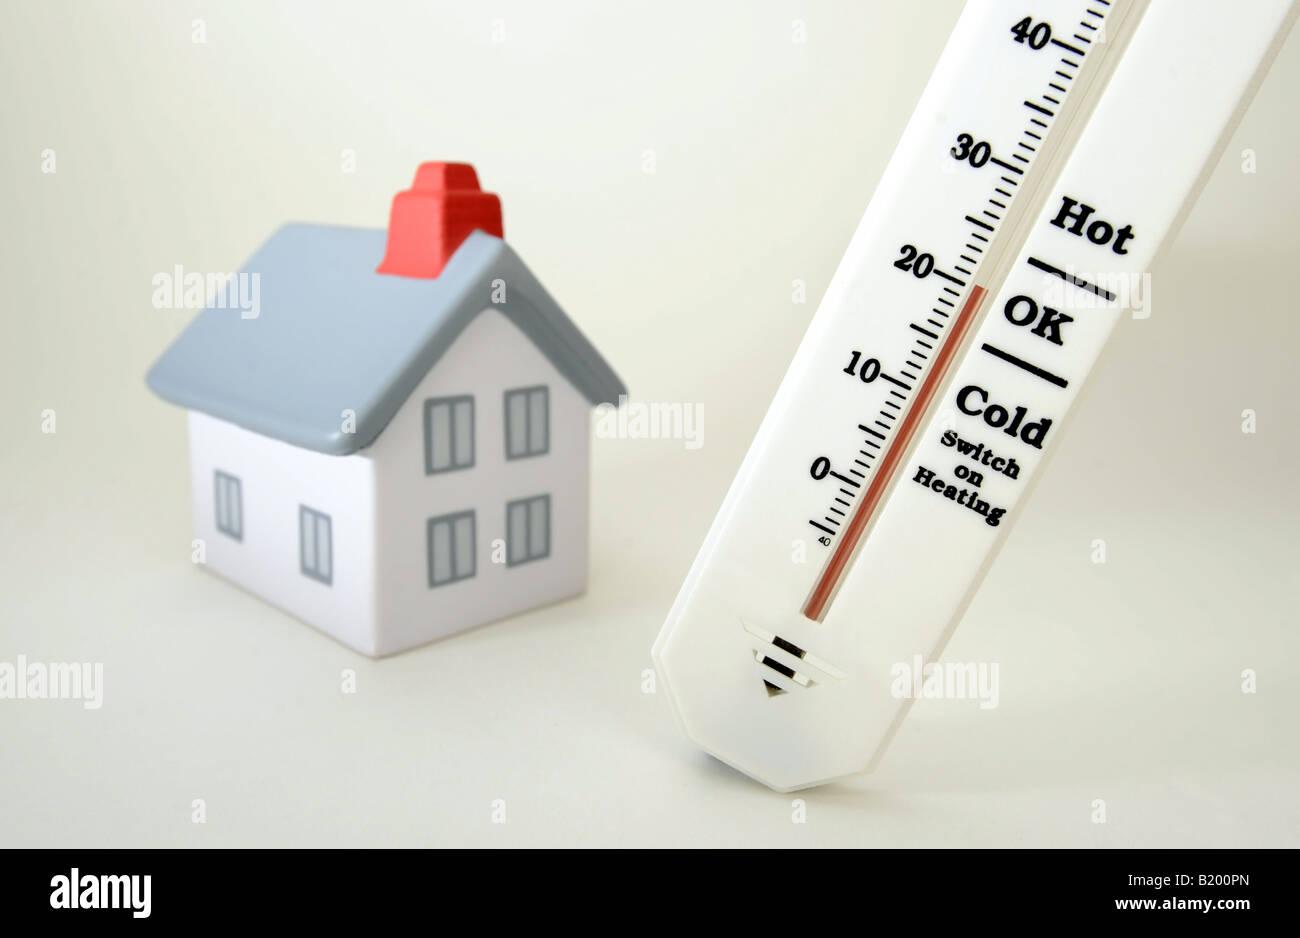 Haus Mit Thermometer Zeigt 20 Grad Celsius Raumtemperatur Re